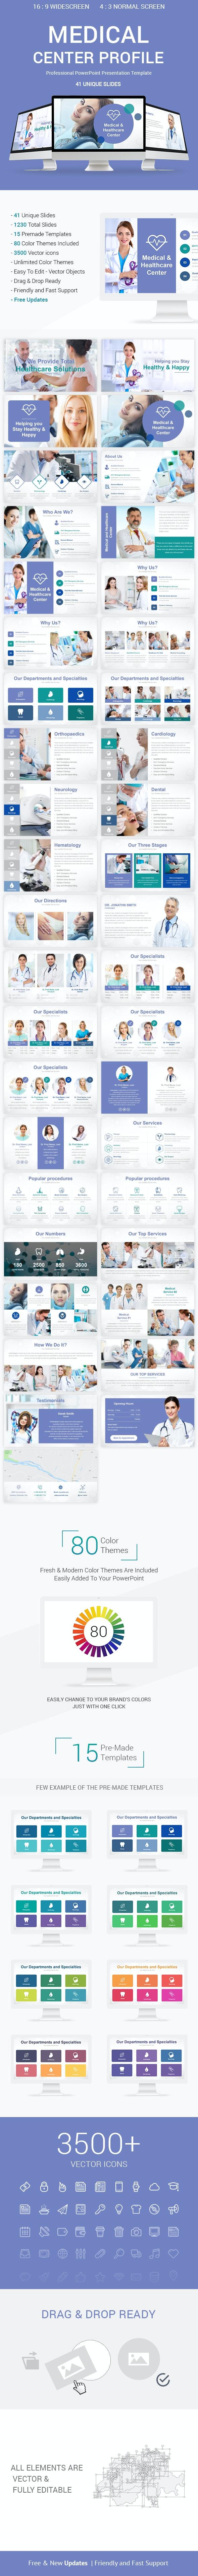 Medical Center Profile PowerPoint Presentation Template Designs - Creative PowerPoint Templates